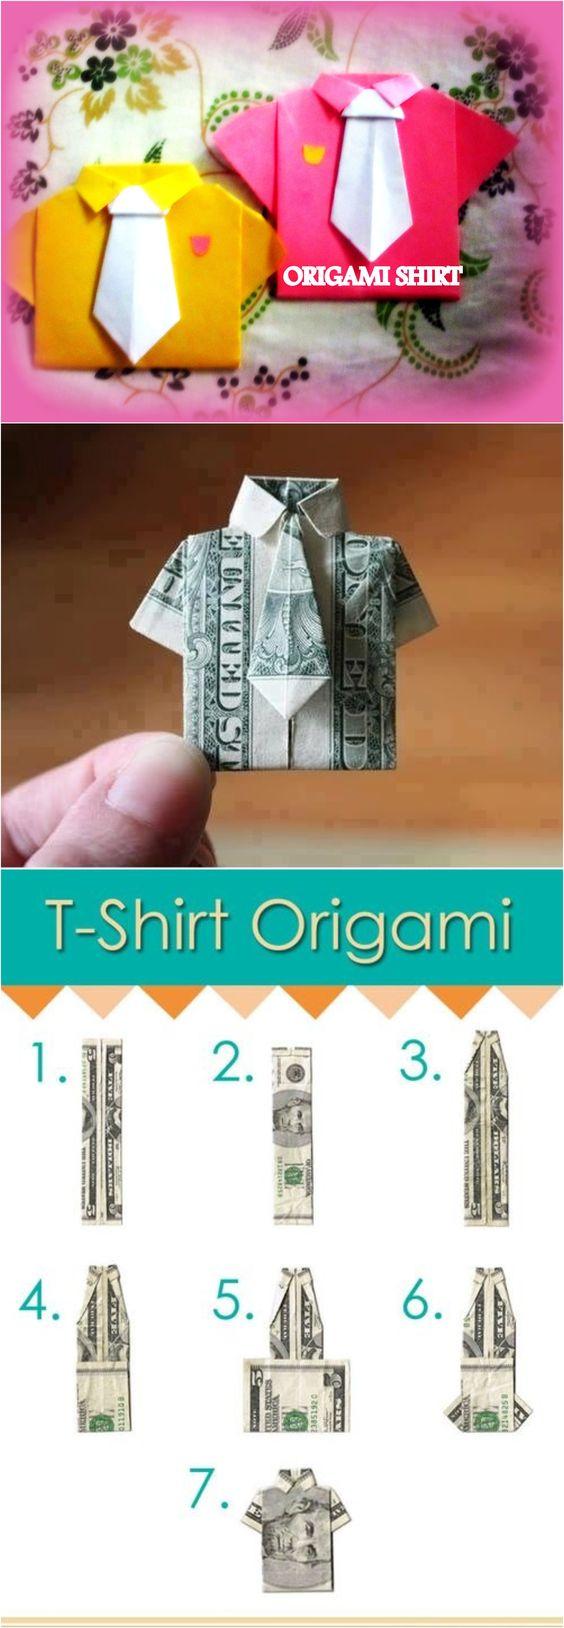 How to Make Cute DIY T-Shirt Origami